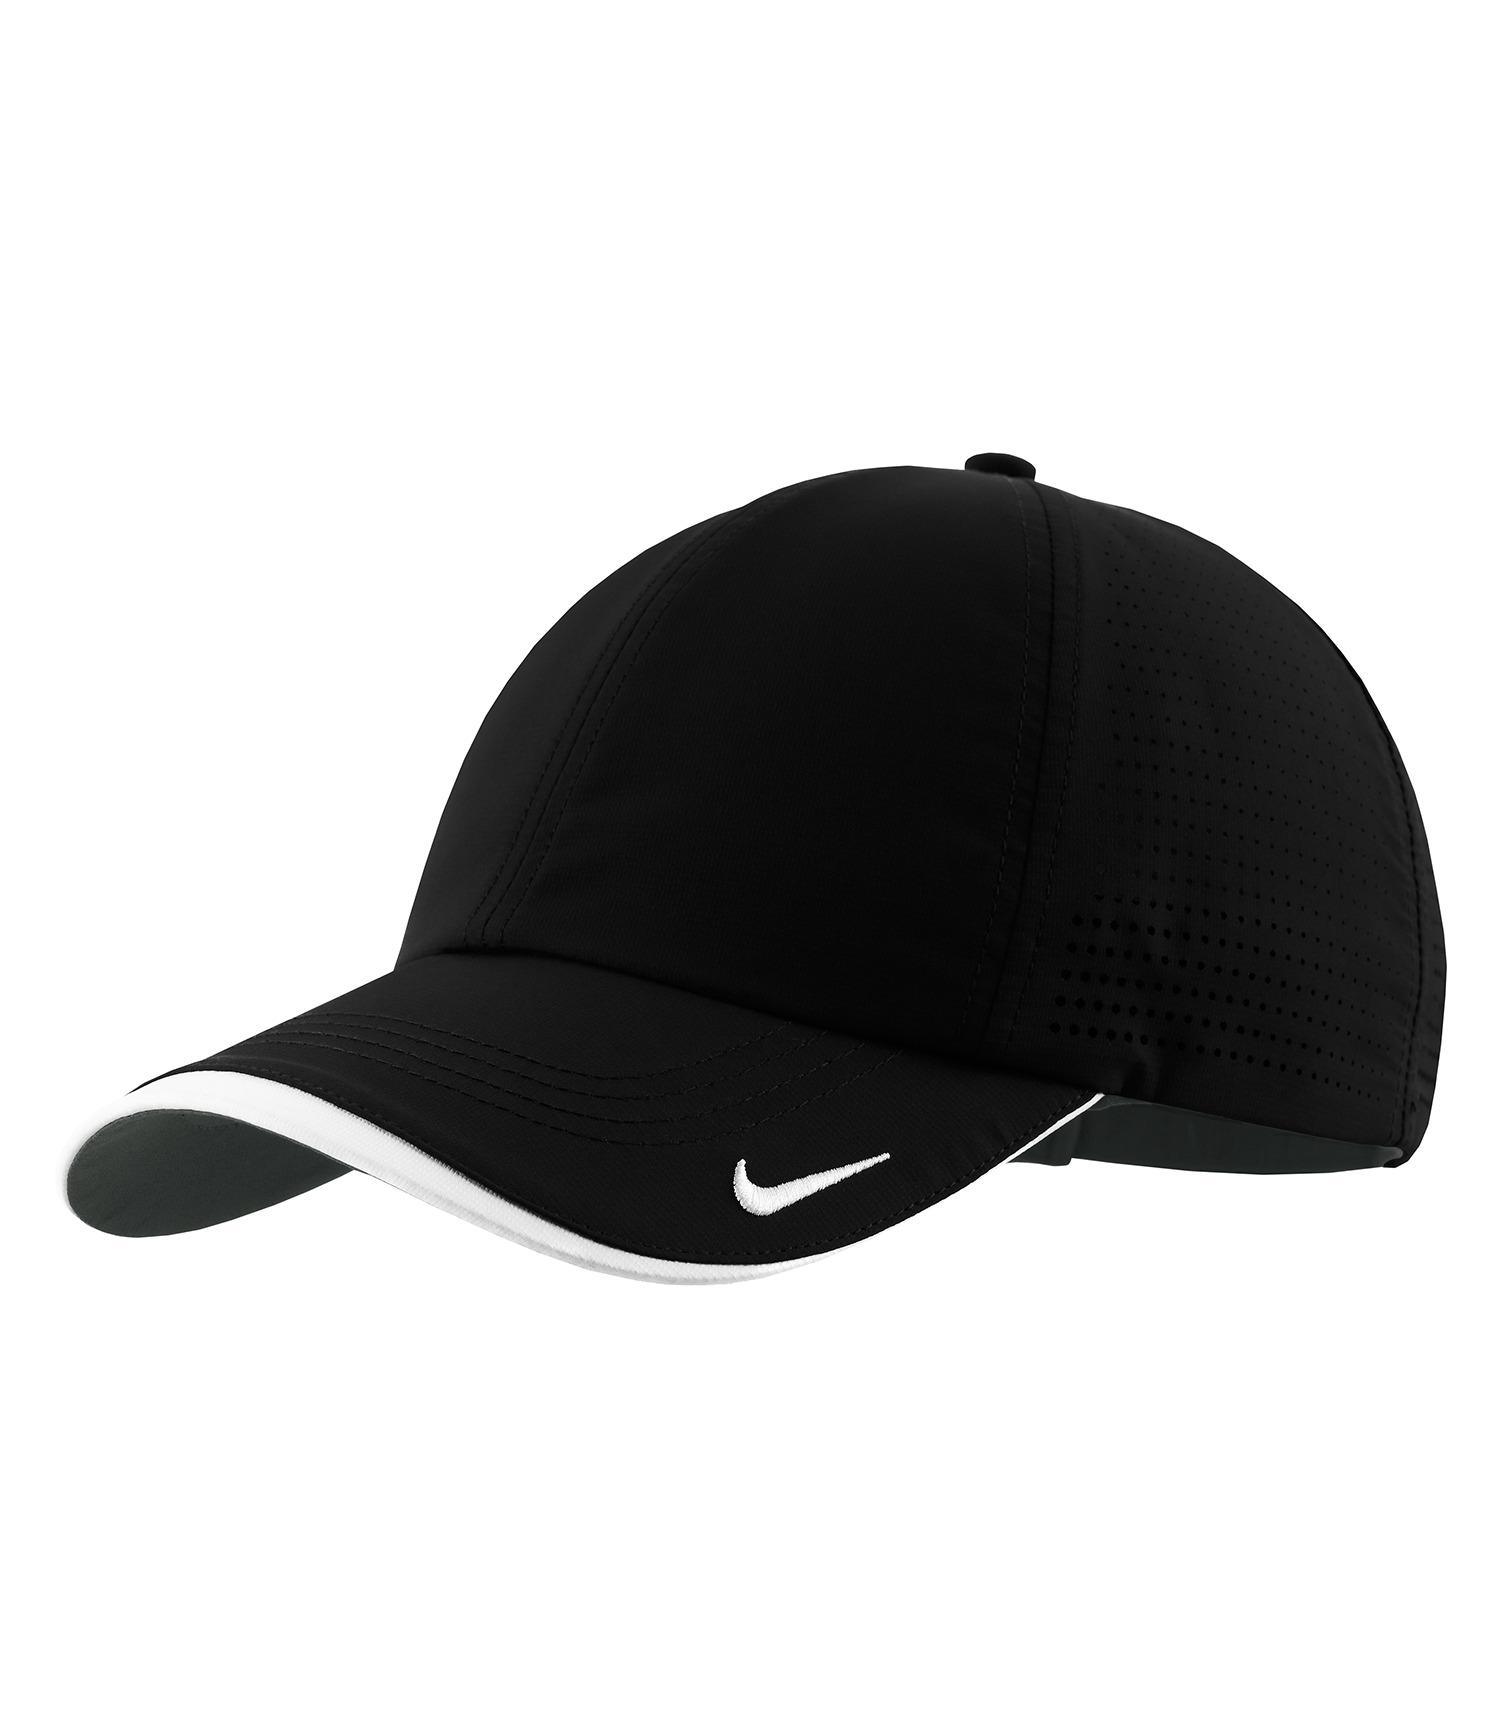 Picture of Nike Dri-Fit Swoosh Perforated Cap